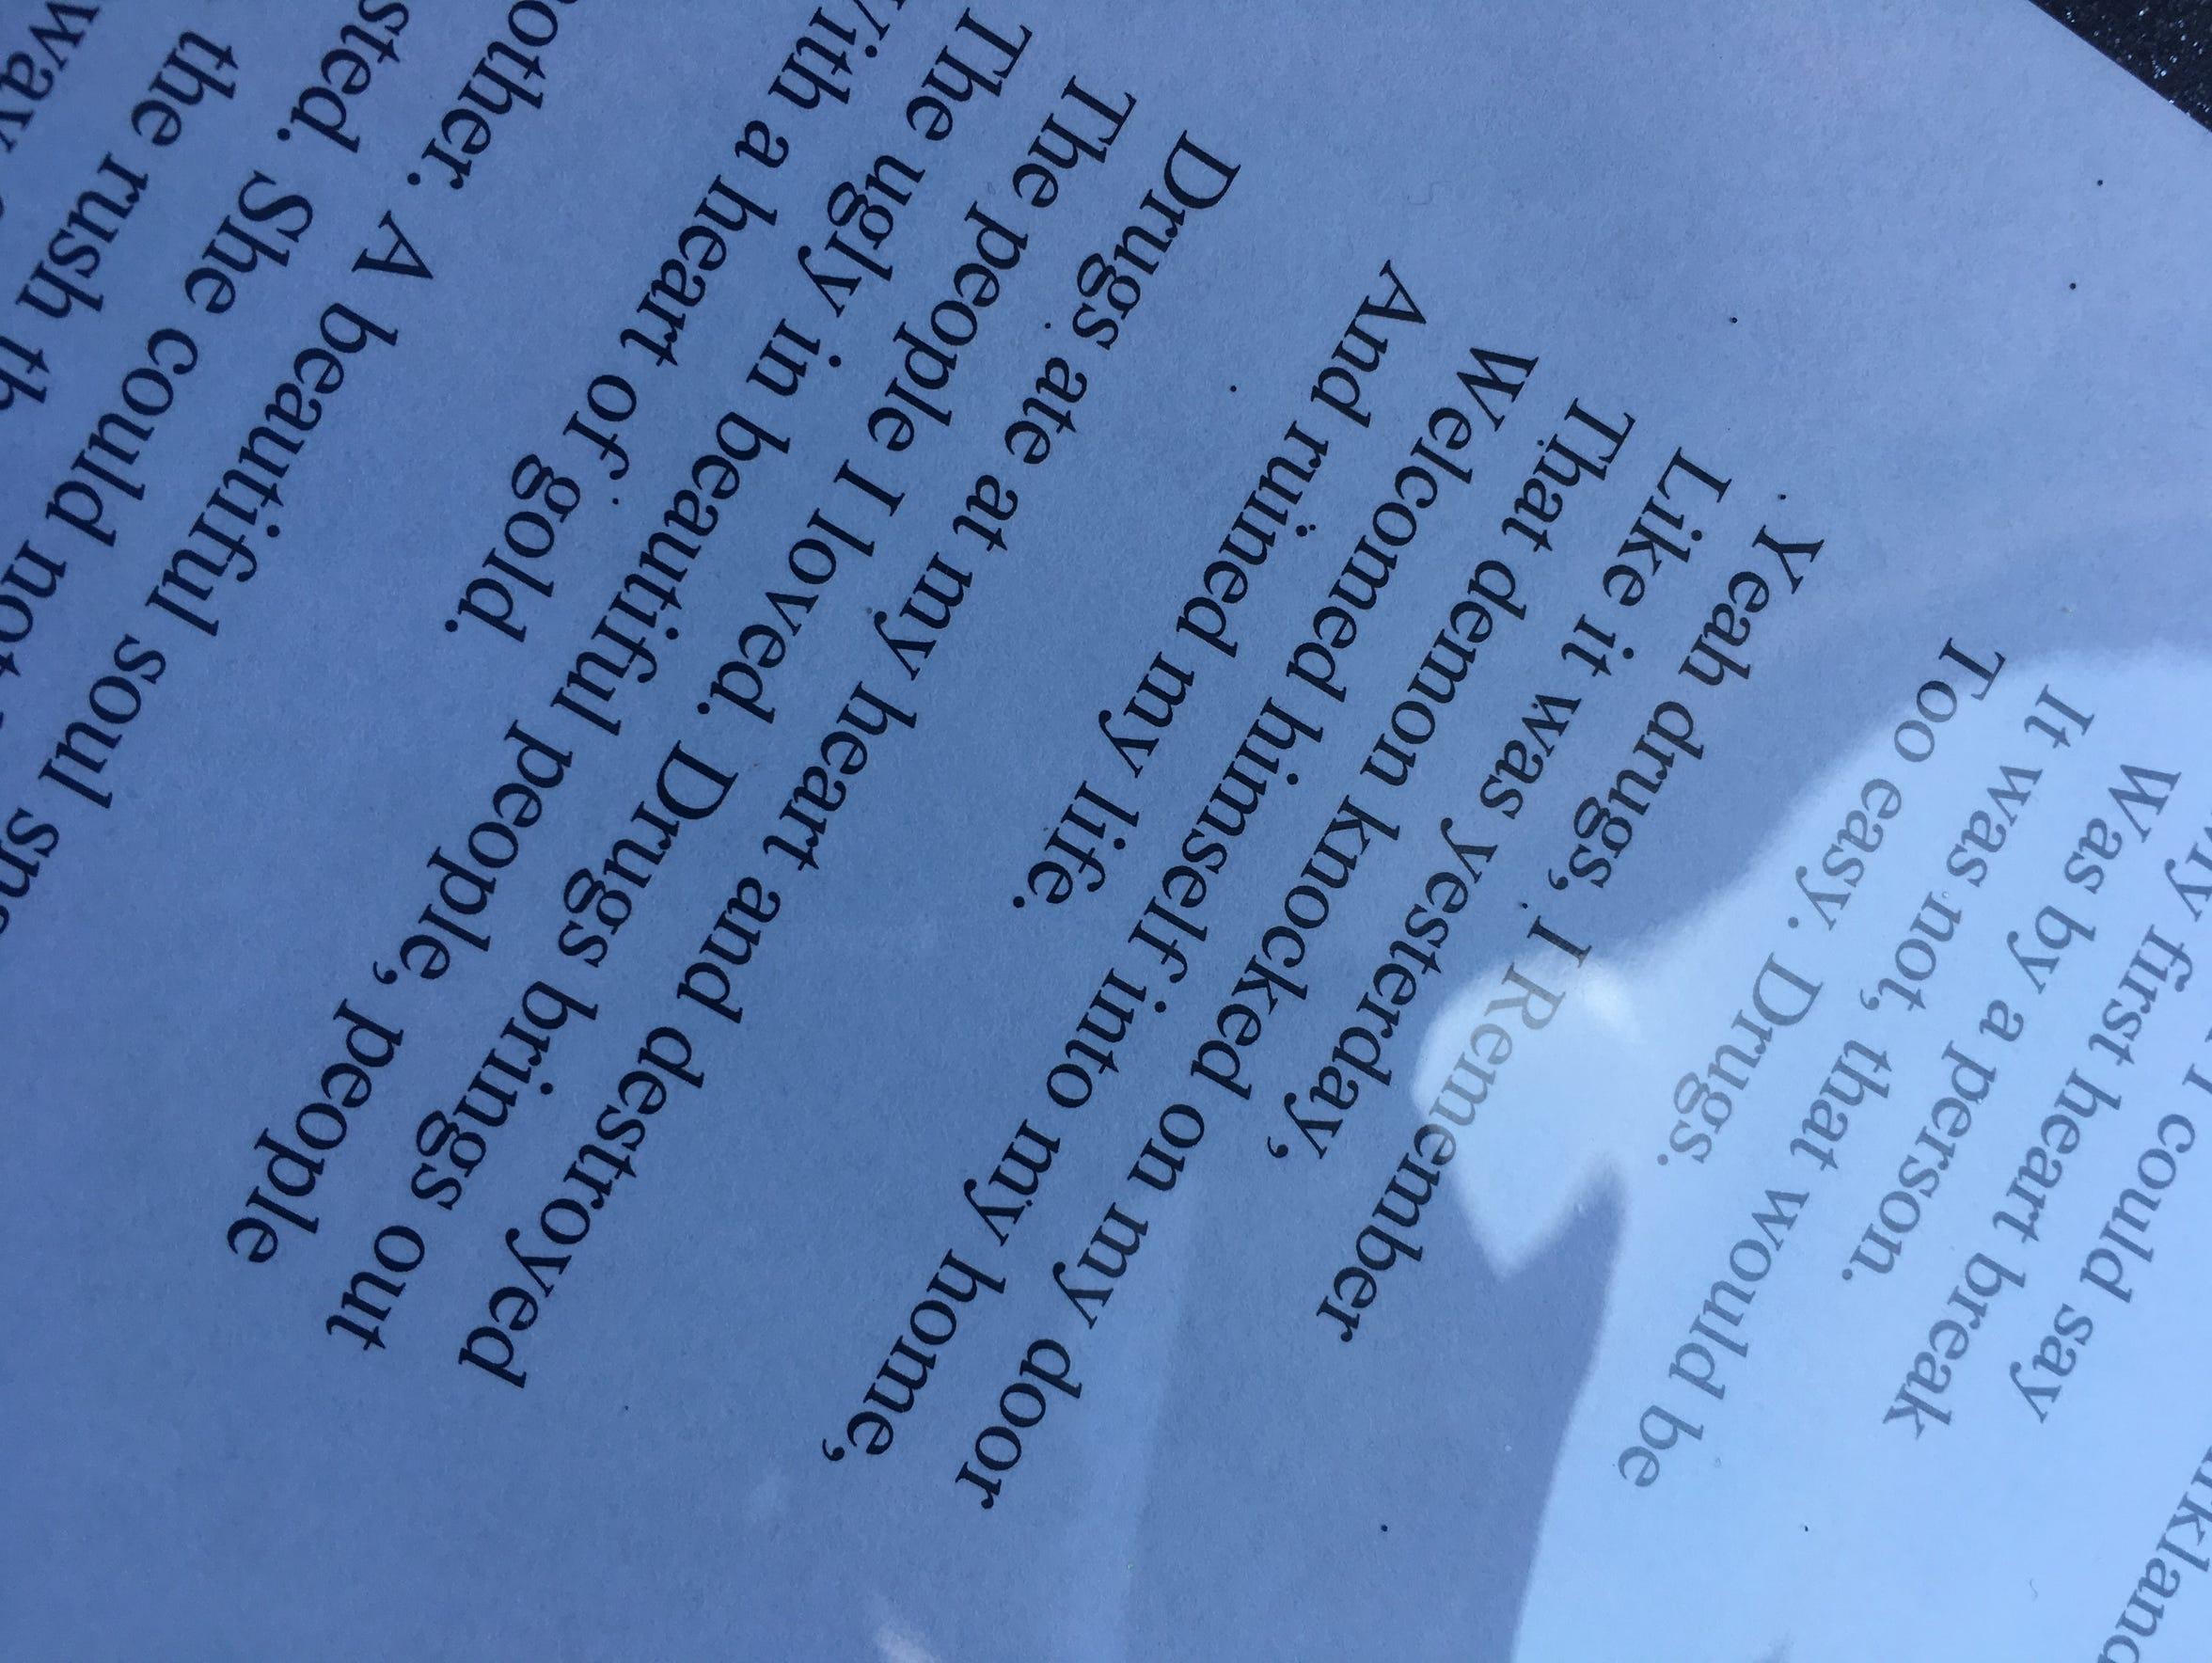 A photo of a poem Davi'Ana Kirkland, a Sparks High